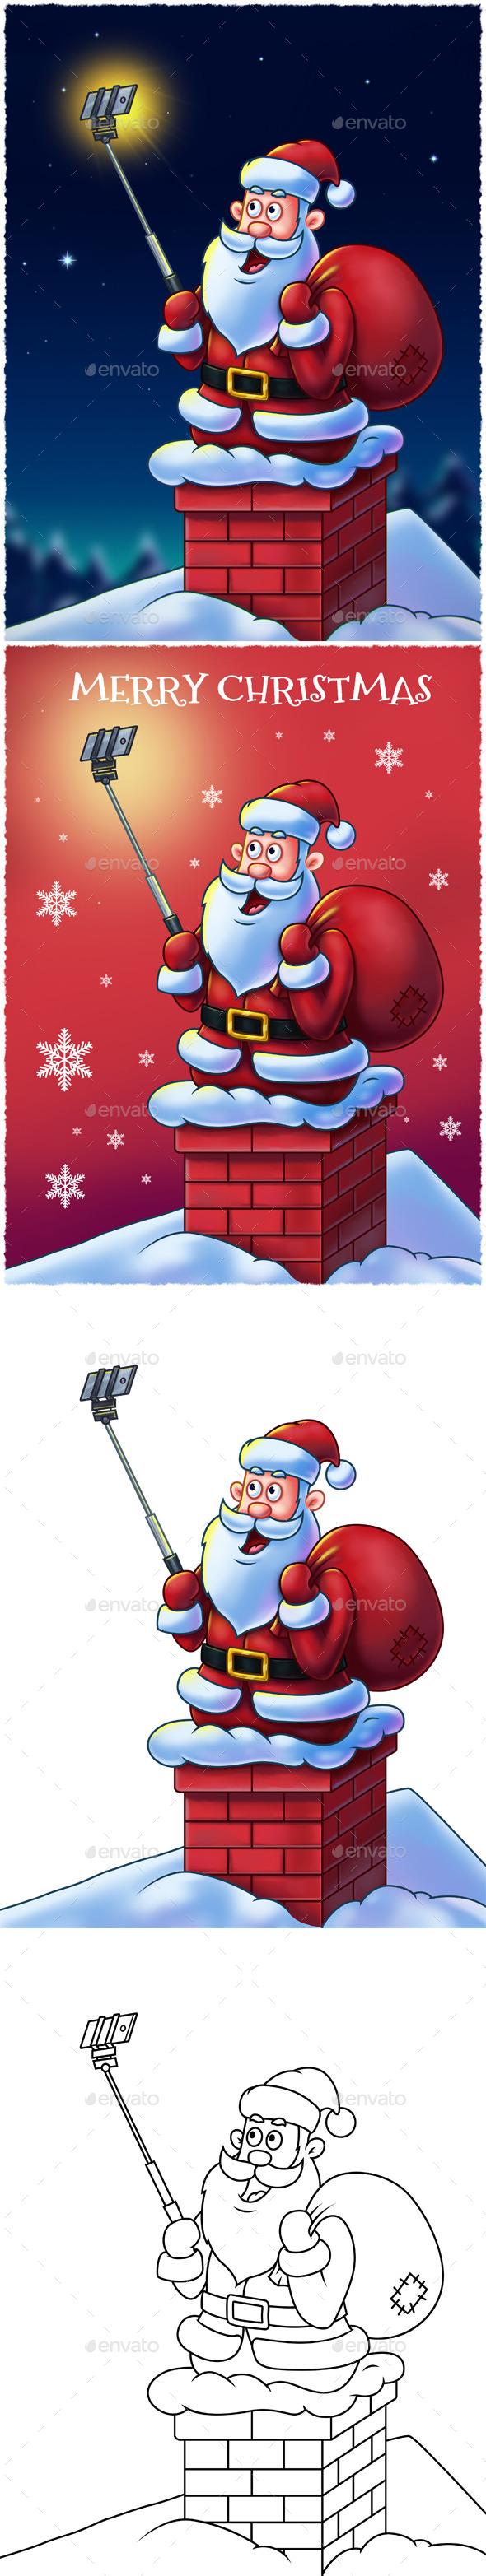 Santa Claus with Selfie Stick